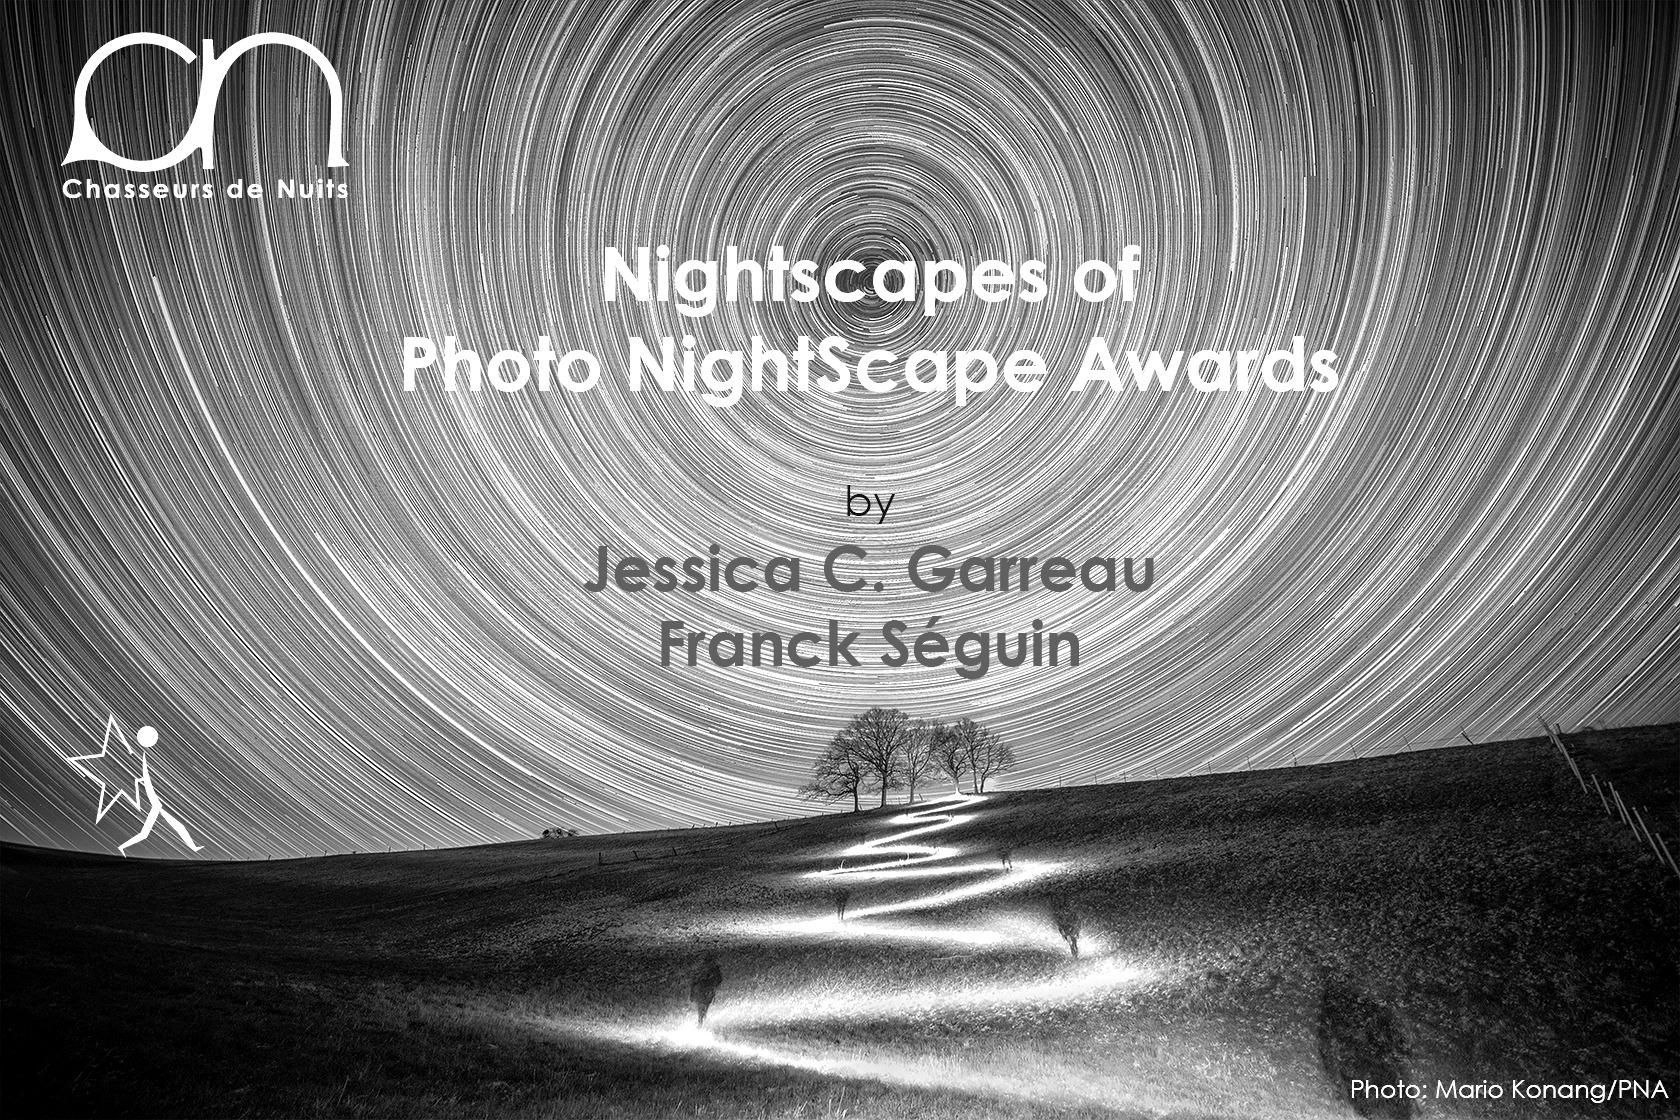 Franck Séguin & Jessica C. Garreau